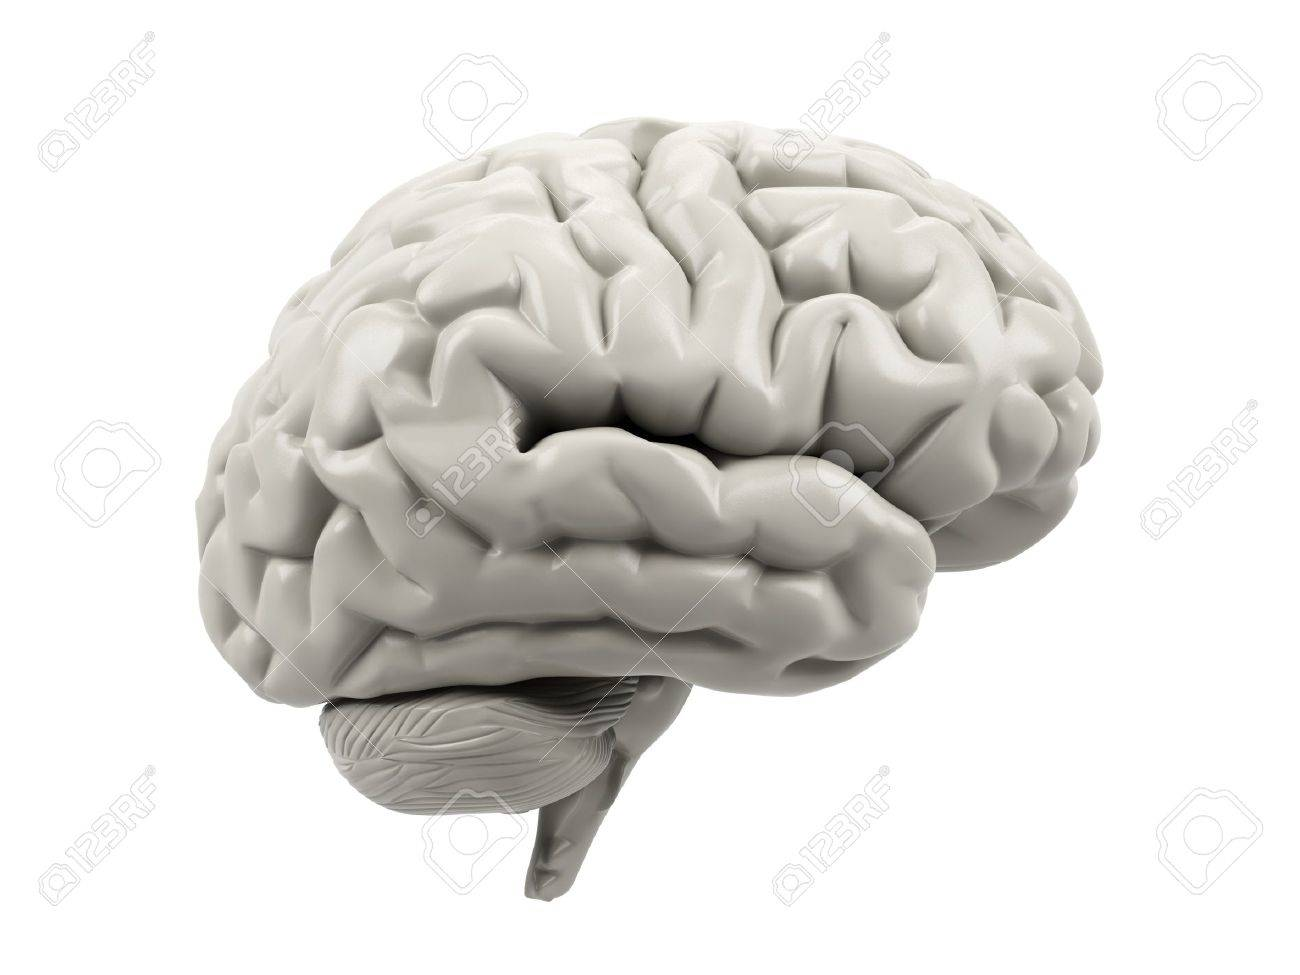 Human brain on a white background. Stock Photo - 15536490